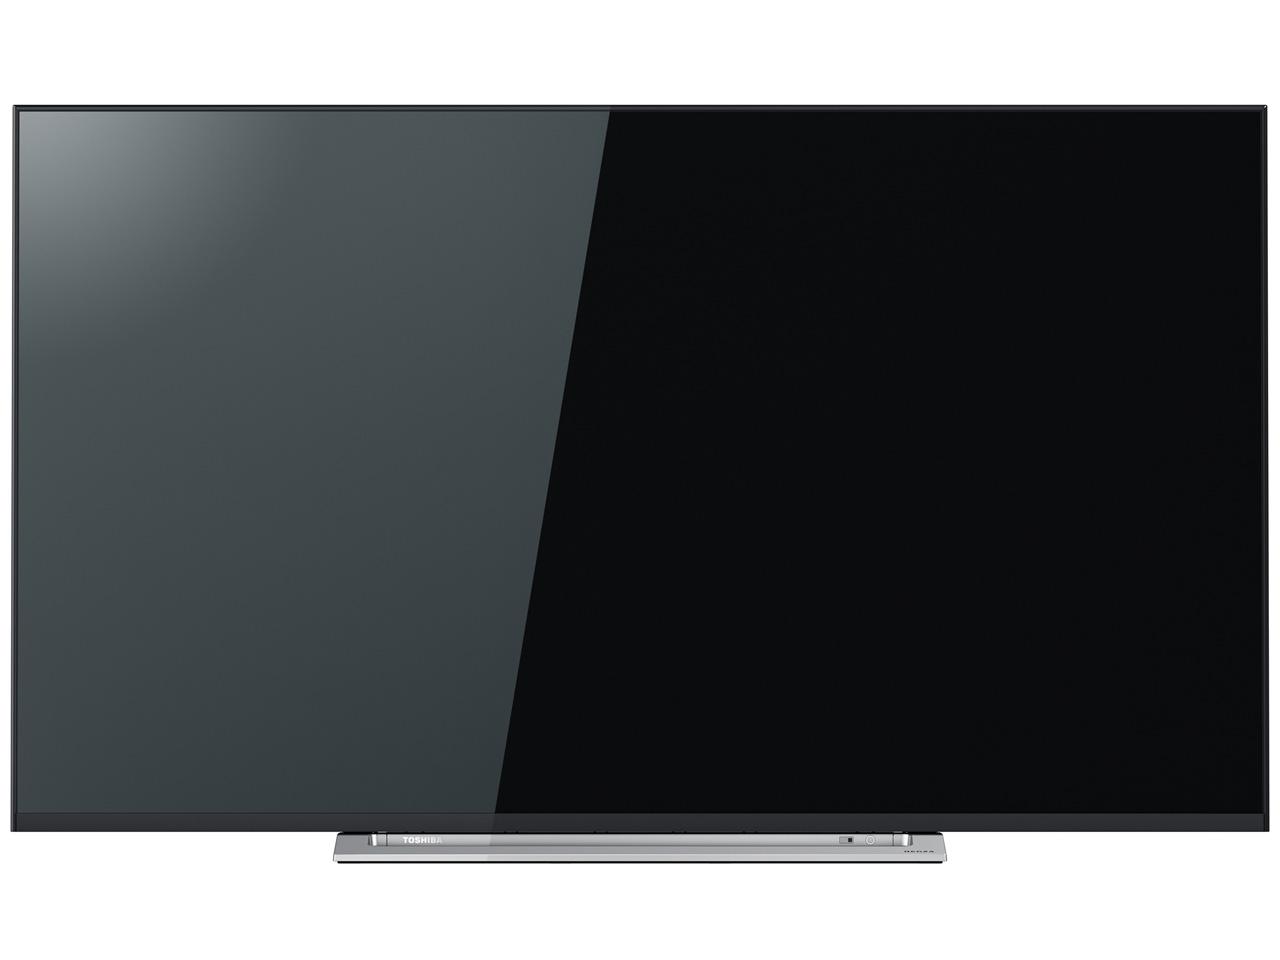 REGZA 50M520X [50インチ] の製品画像